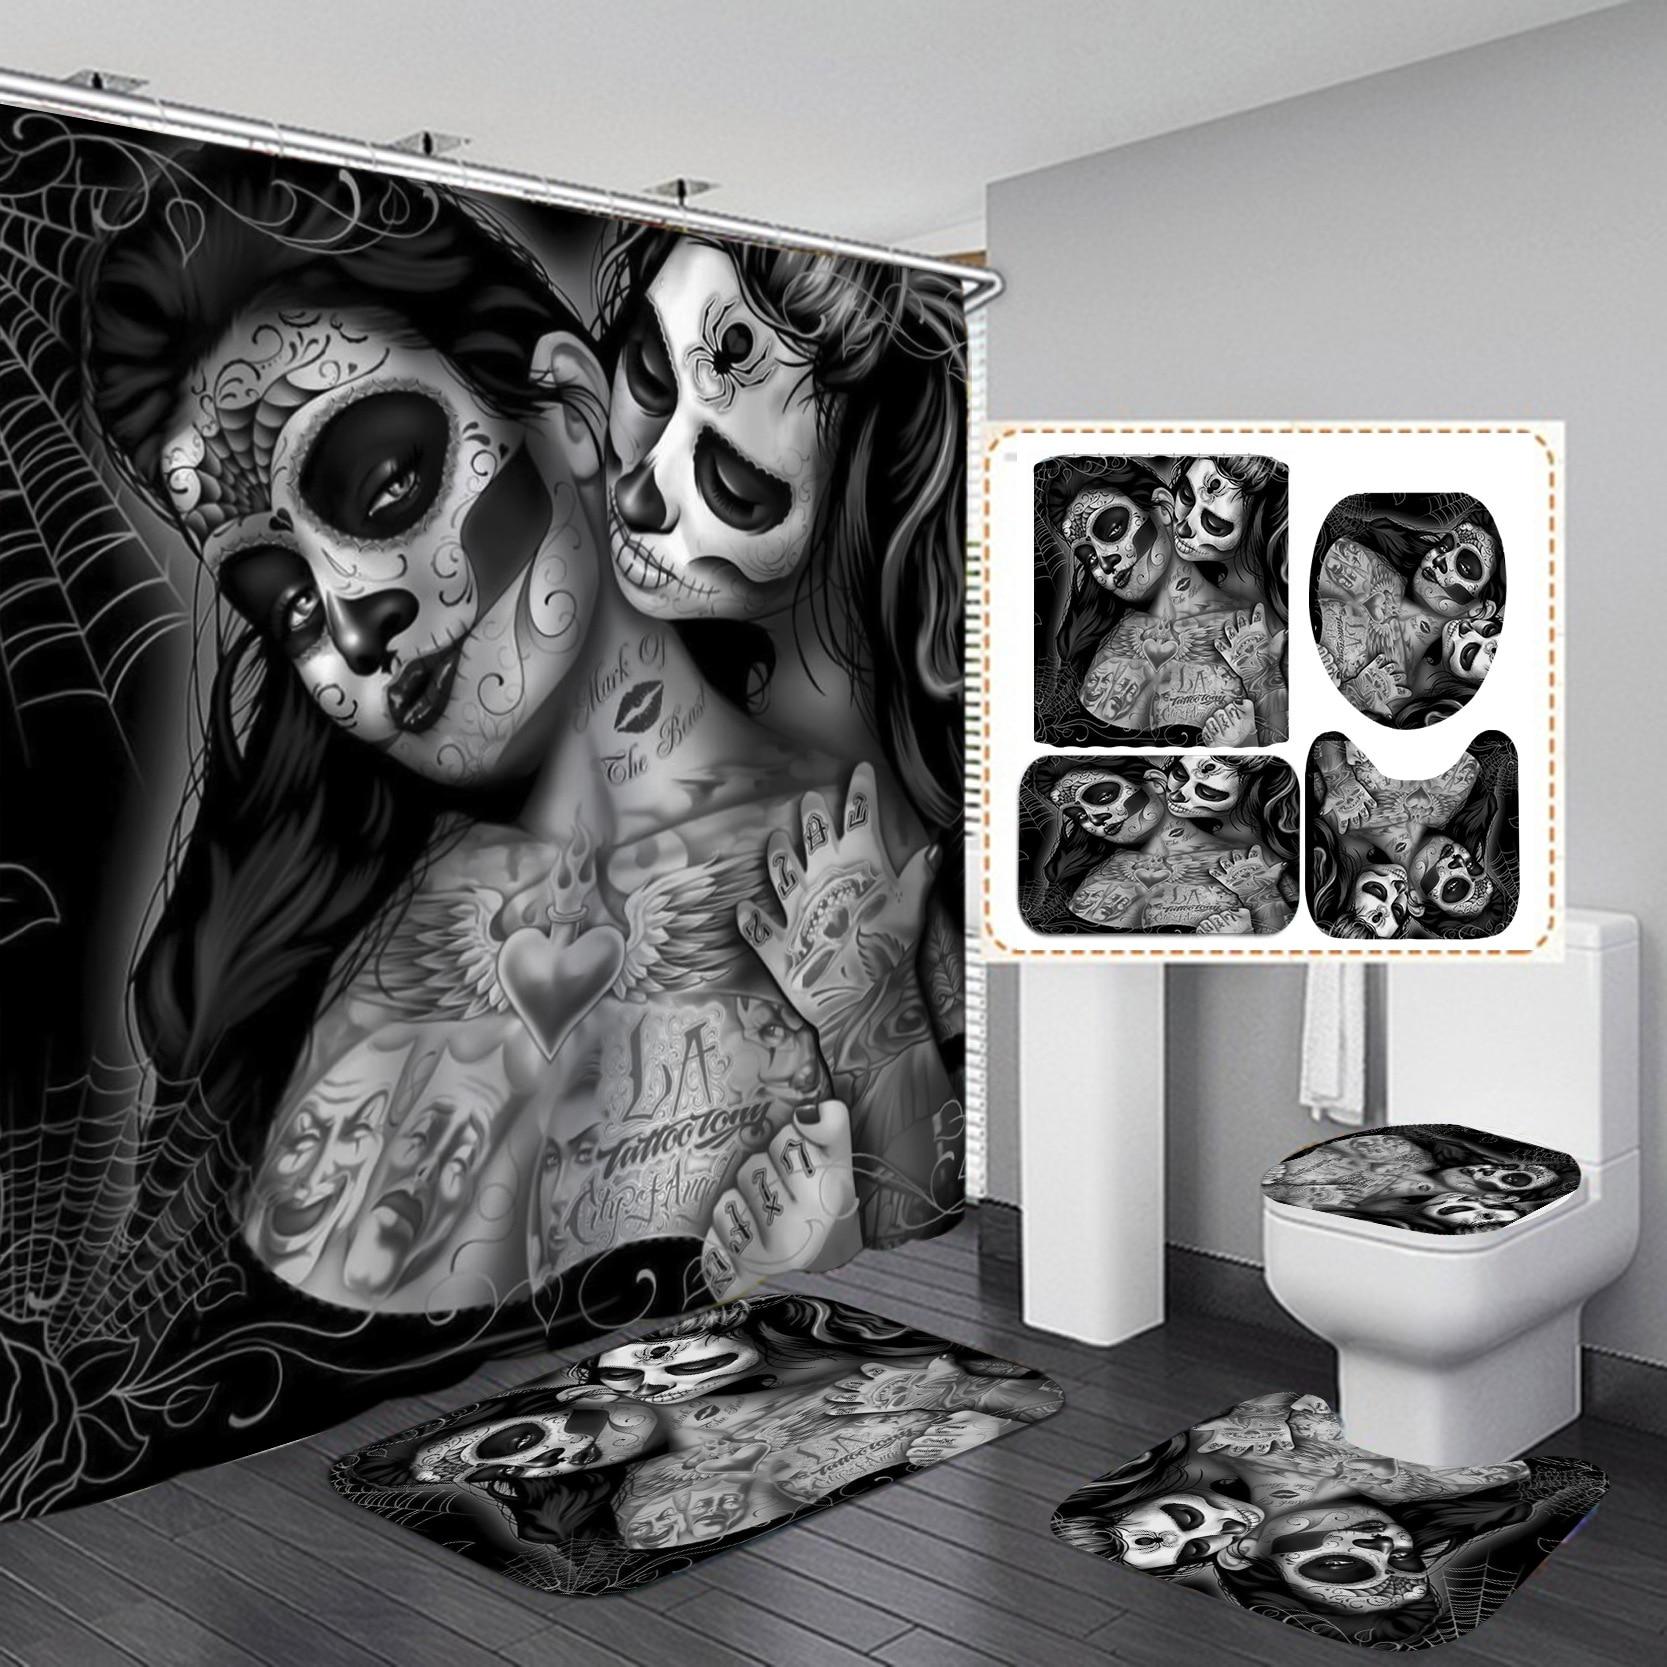 Waterproof Shower Curtains BathroomNon-Slip Rug Toilet Lid Cover Bath Mat Cortina de ducha impermeableRideau de douche toilette